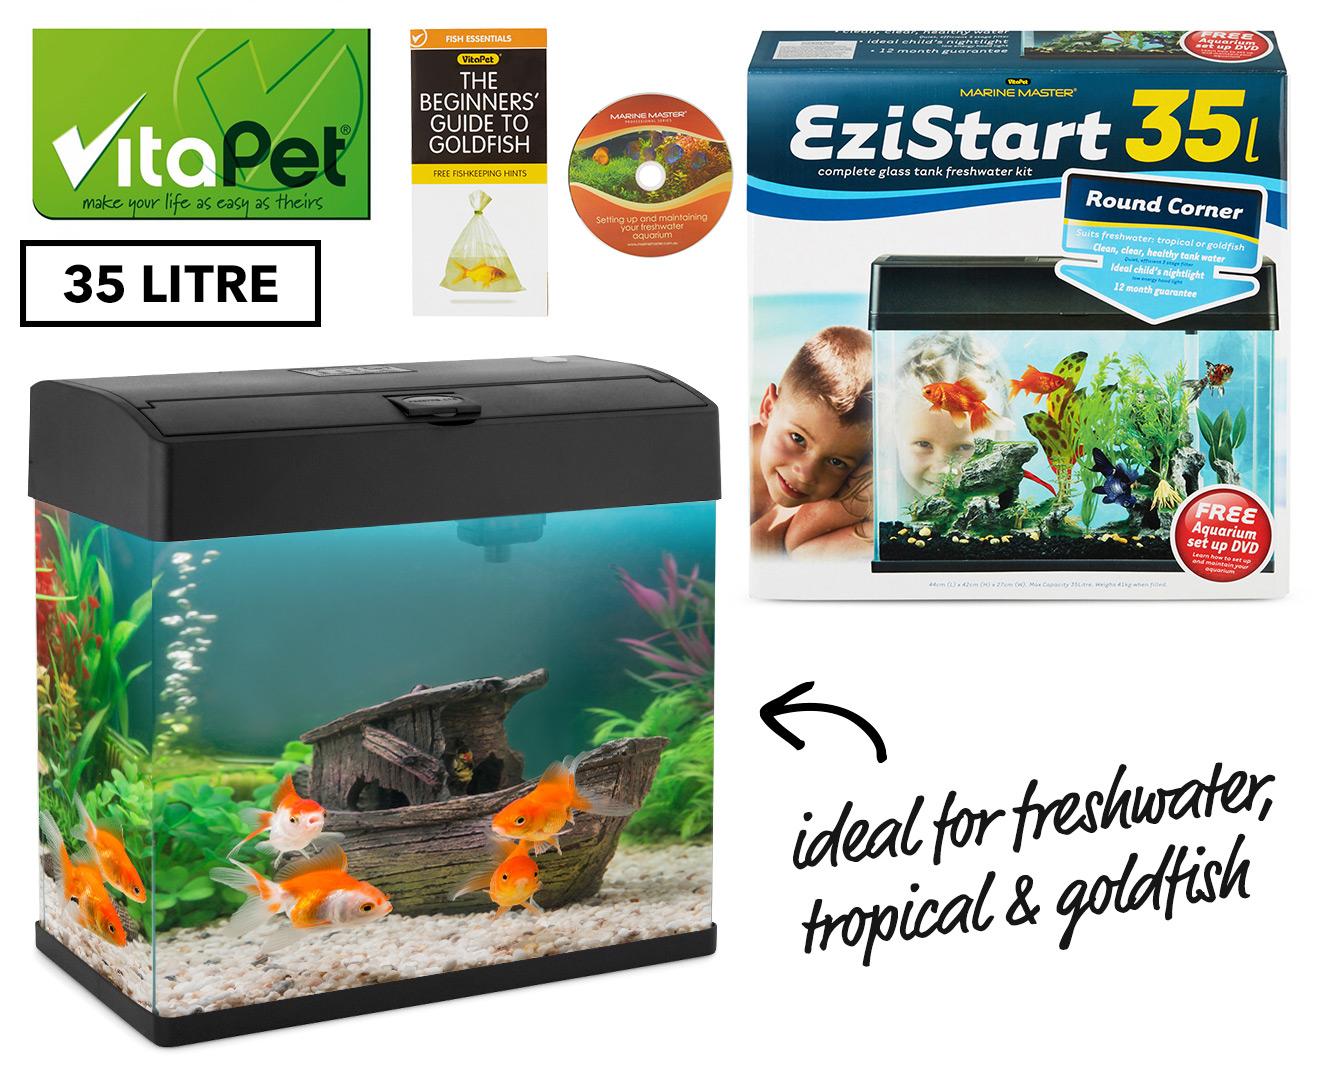 Vitapet ezistart 35l complete glass freshwater fish tank for Fish tank deals